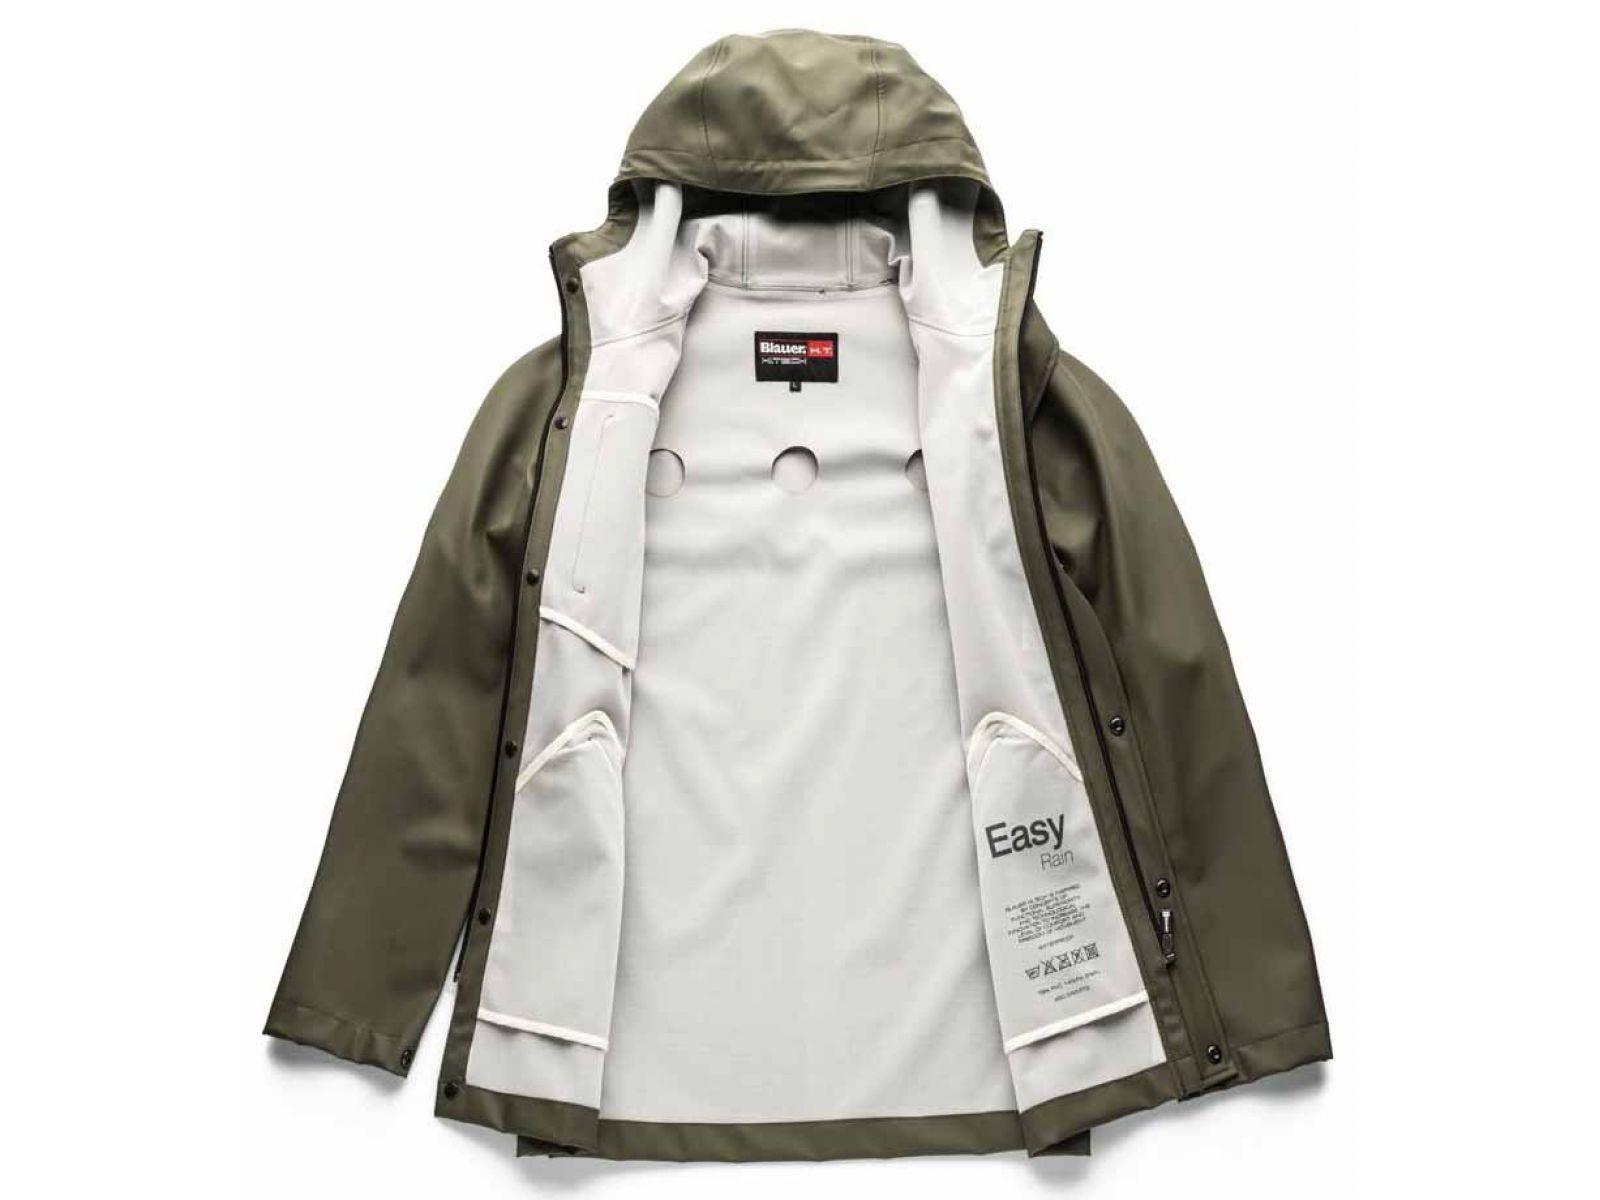 Куртка-дождевик Blauer H.T. Easy Rain Olive Green